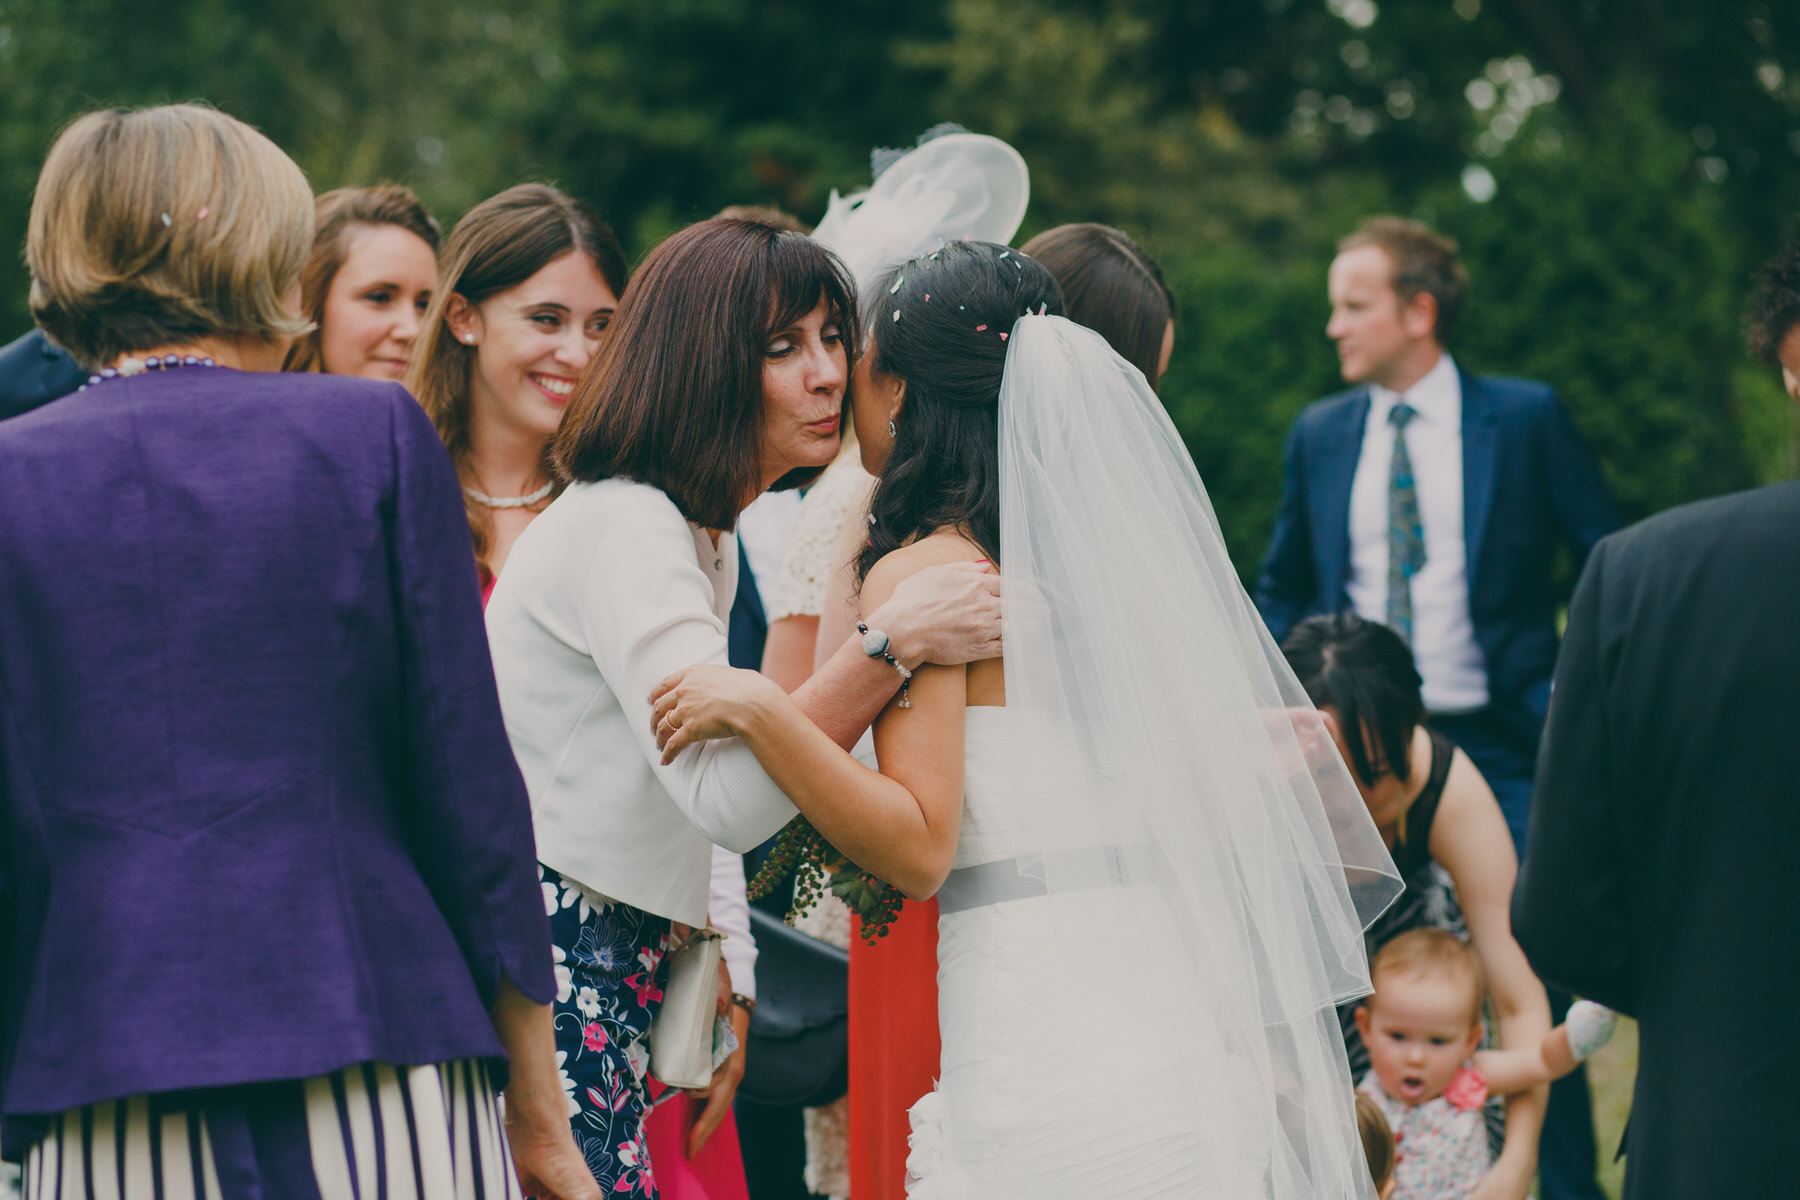 239 Surrey wedding reception drinks guest candid reportage.jpg